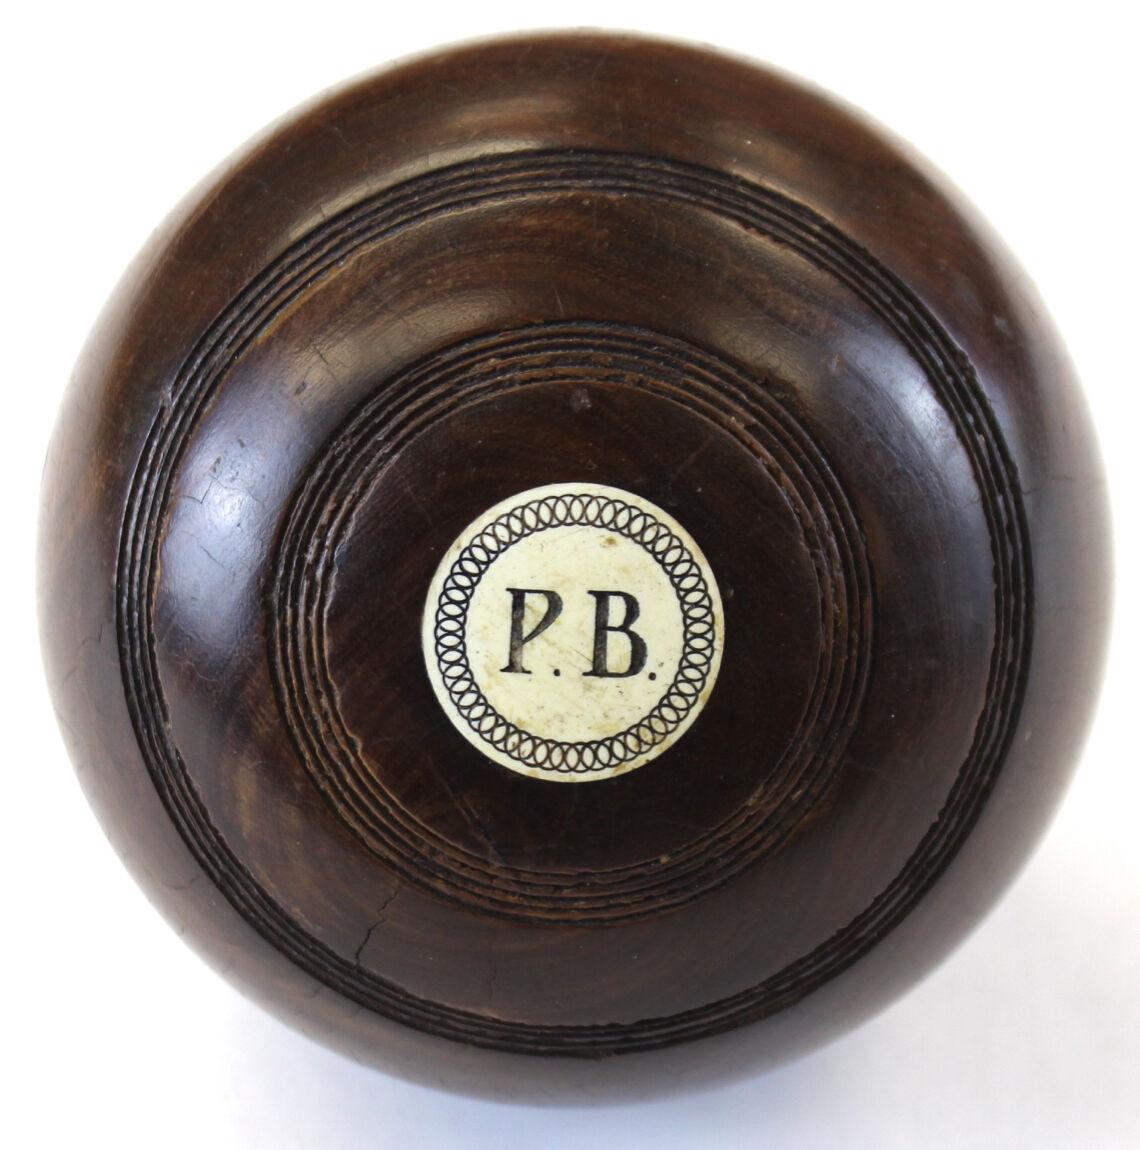 Paul Desmond Brown (P.B.) Jaques & Son Lawn Bowling Ball